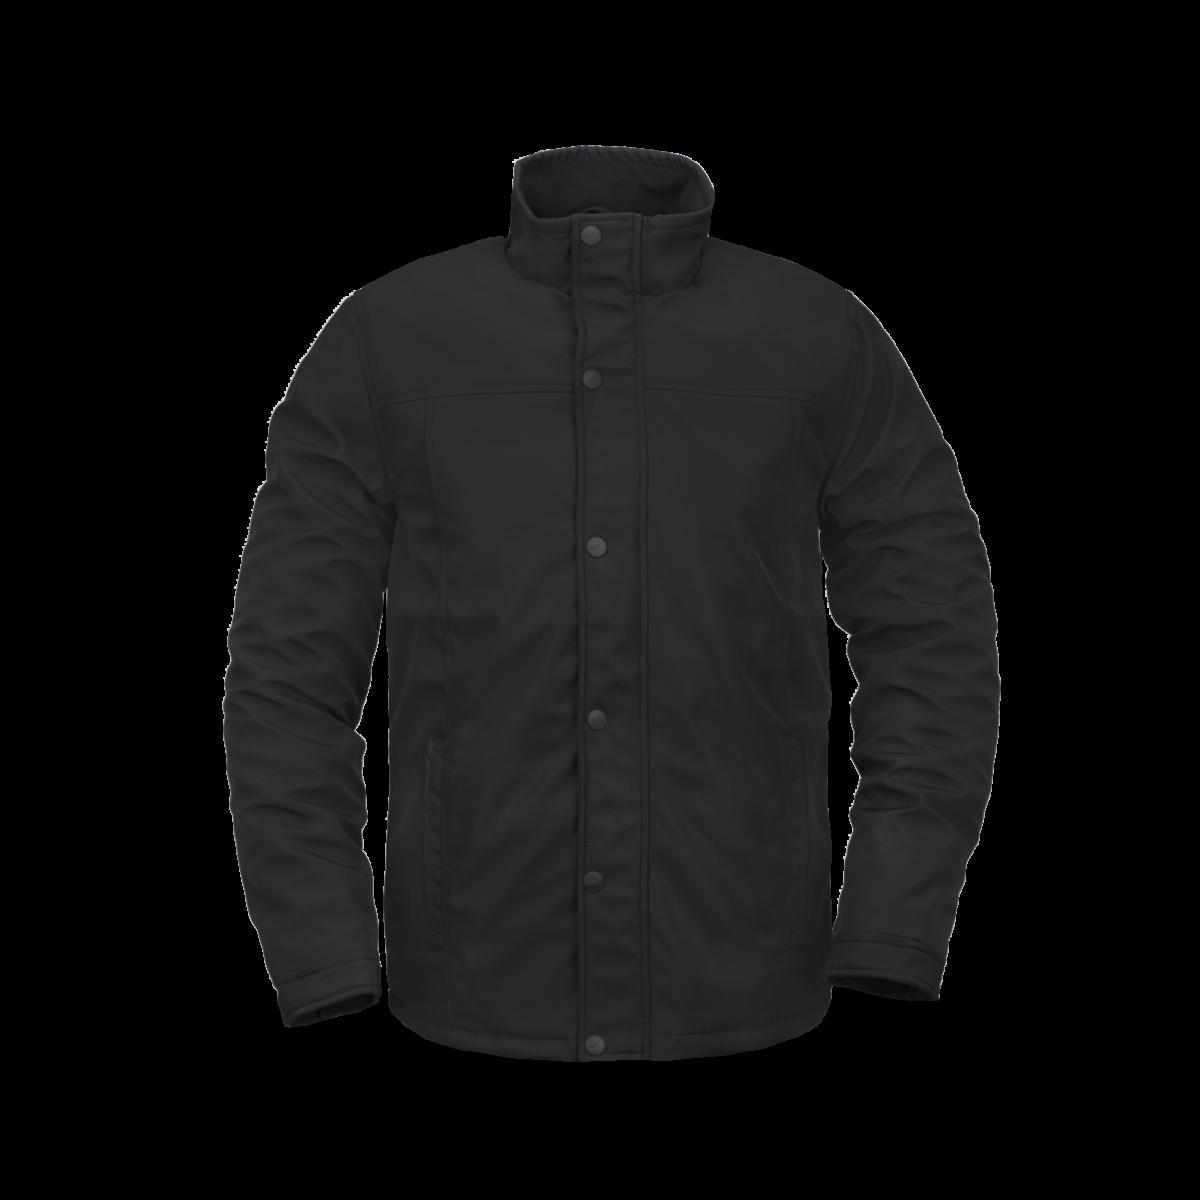 Moška bunda, črna